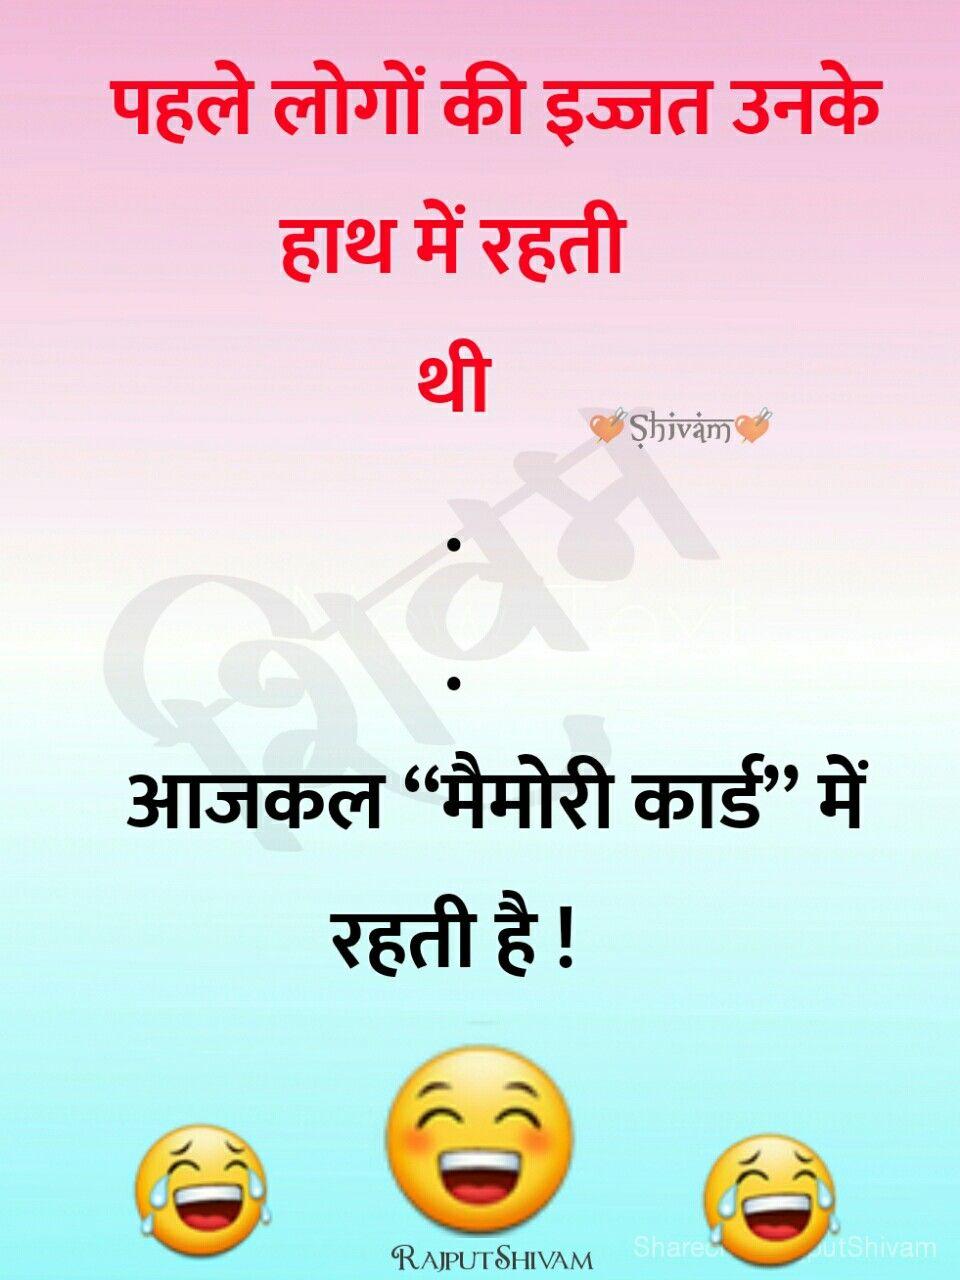 Pin By Shivam On Jokes Funny Quotes Funny Jokes In Hindi Funny